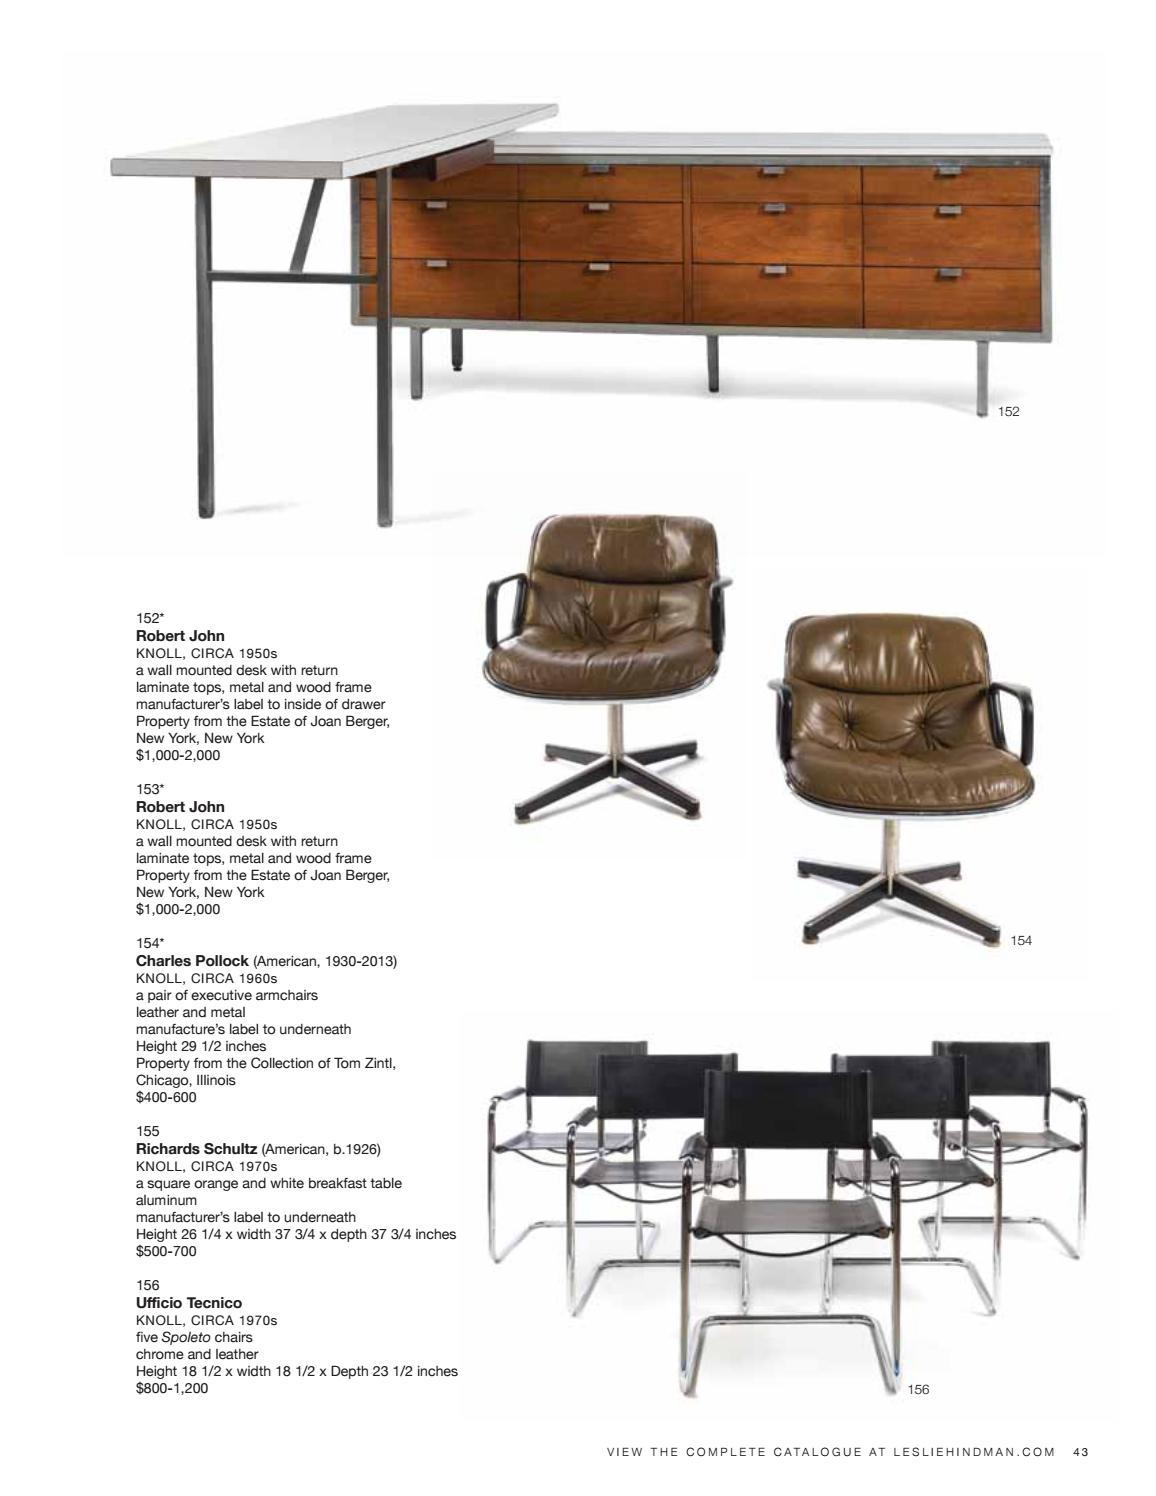 Sale 467 | Modern Design By Leslie Hindman Auctioneers   Issuu